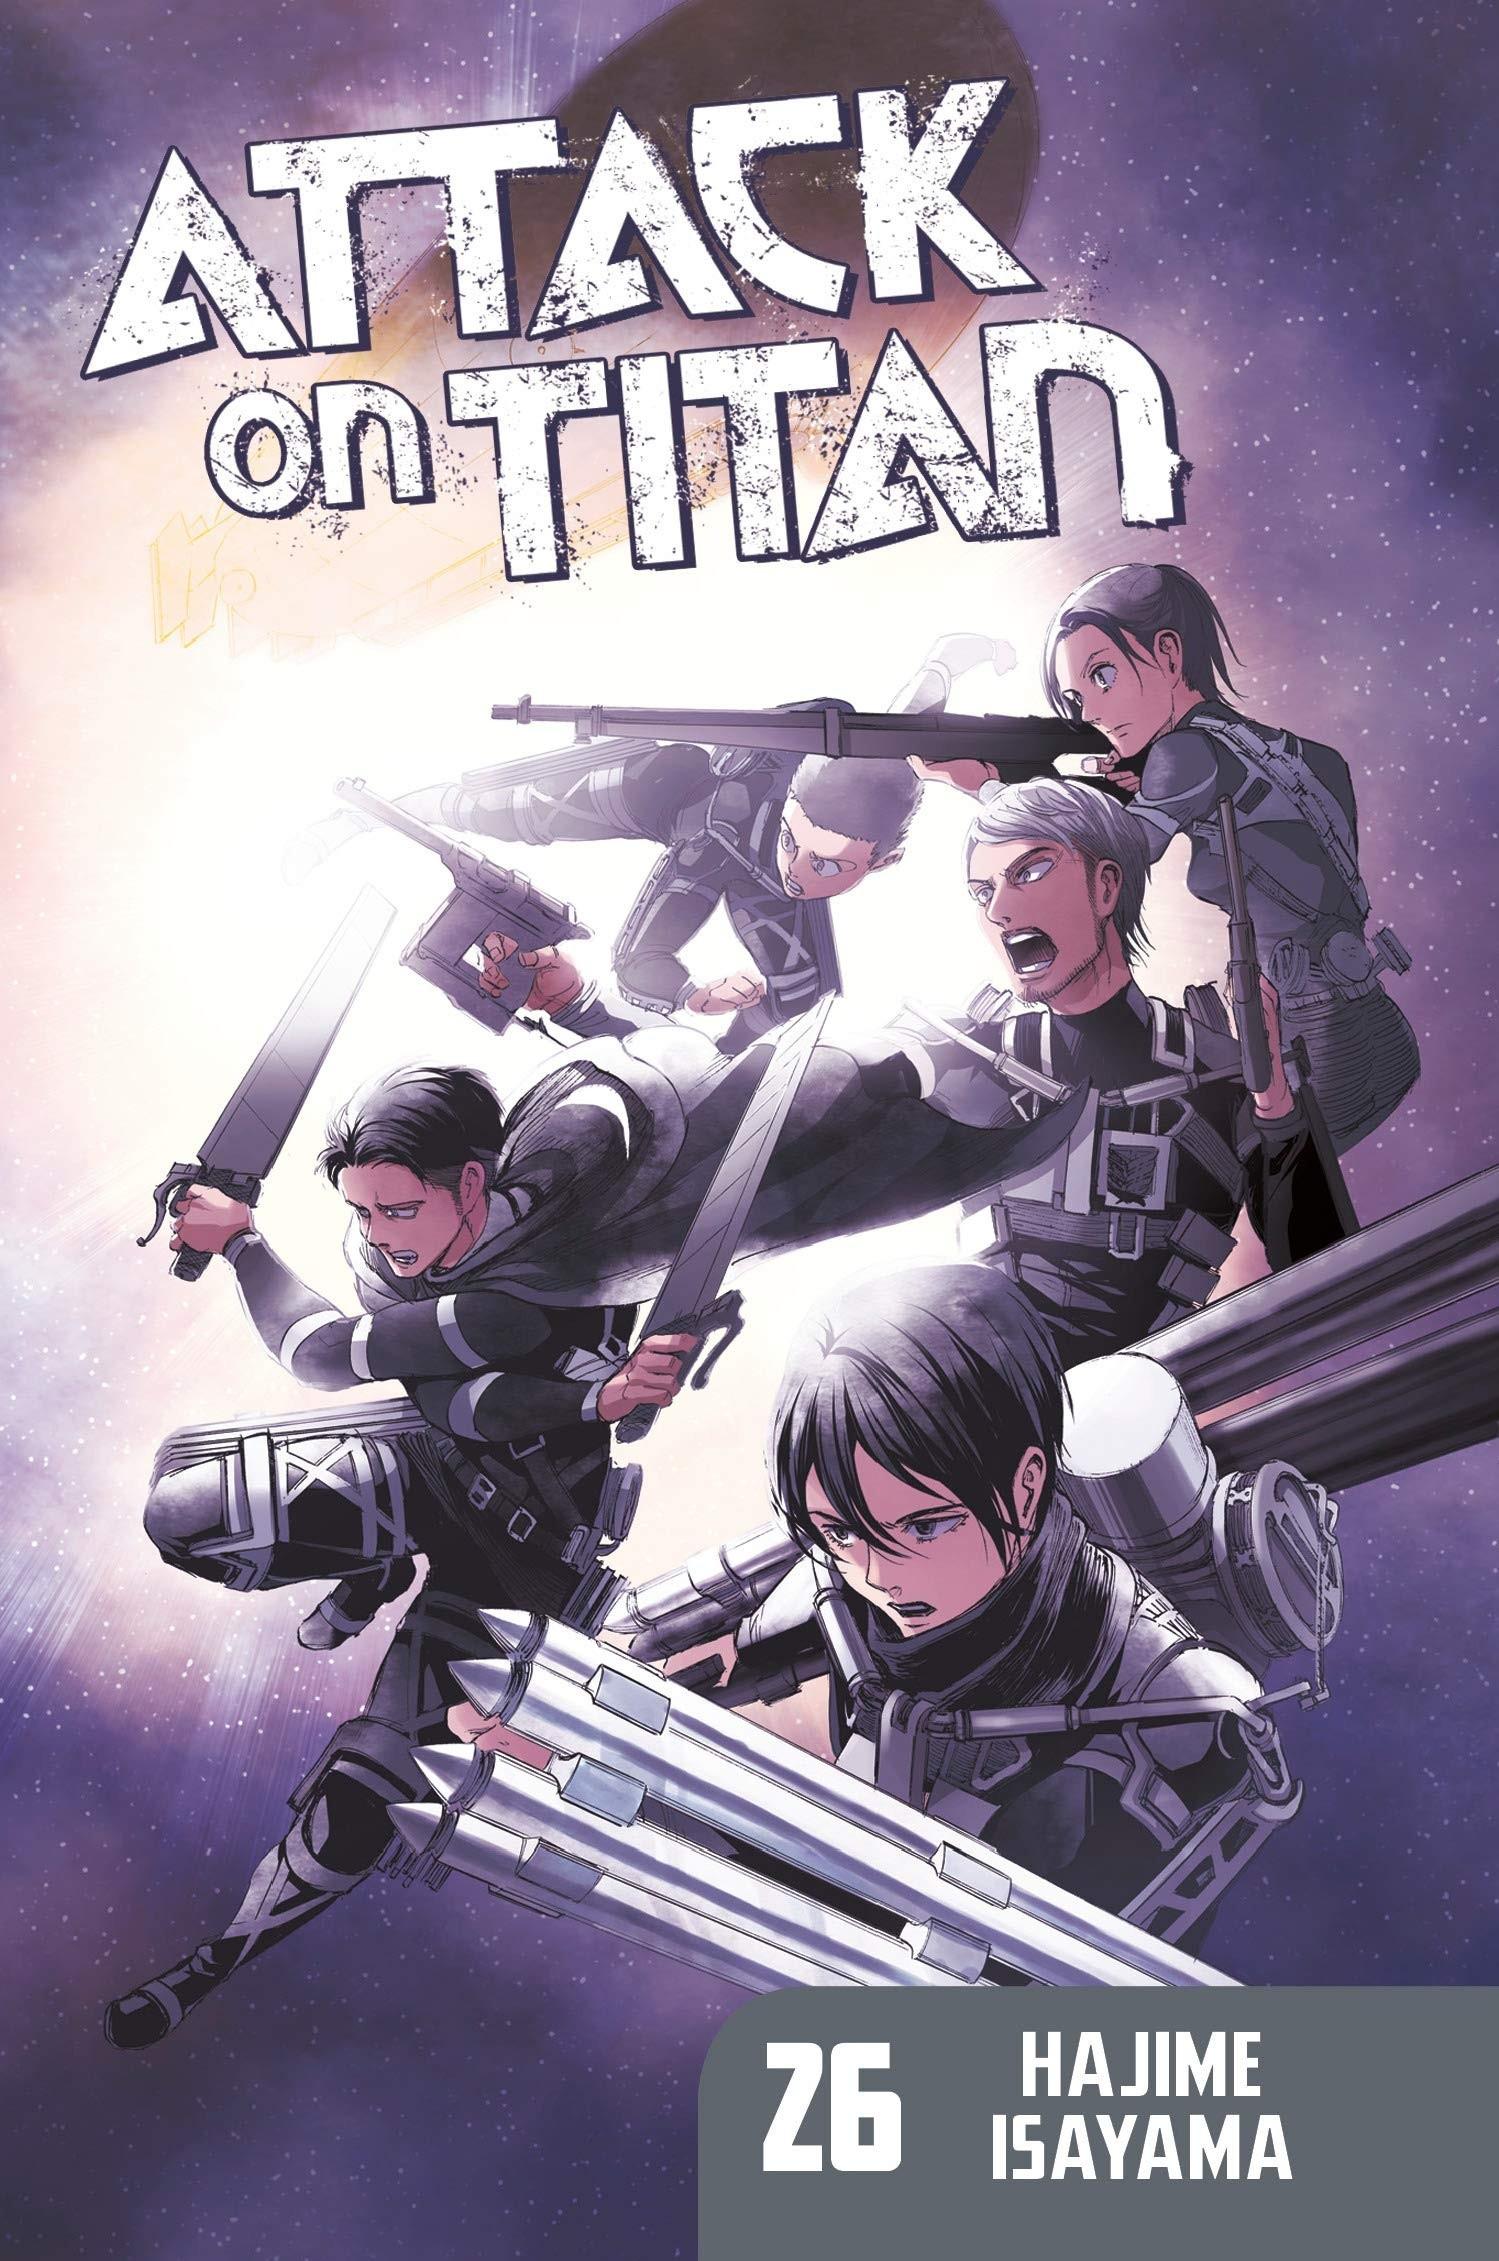 Attack on Titan, Vol. 26 by Hajime Isayama